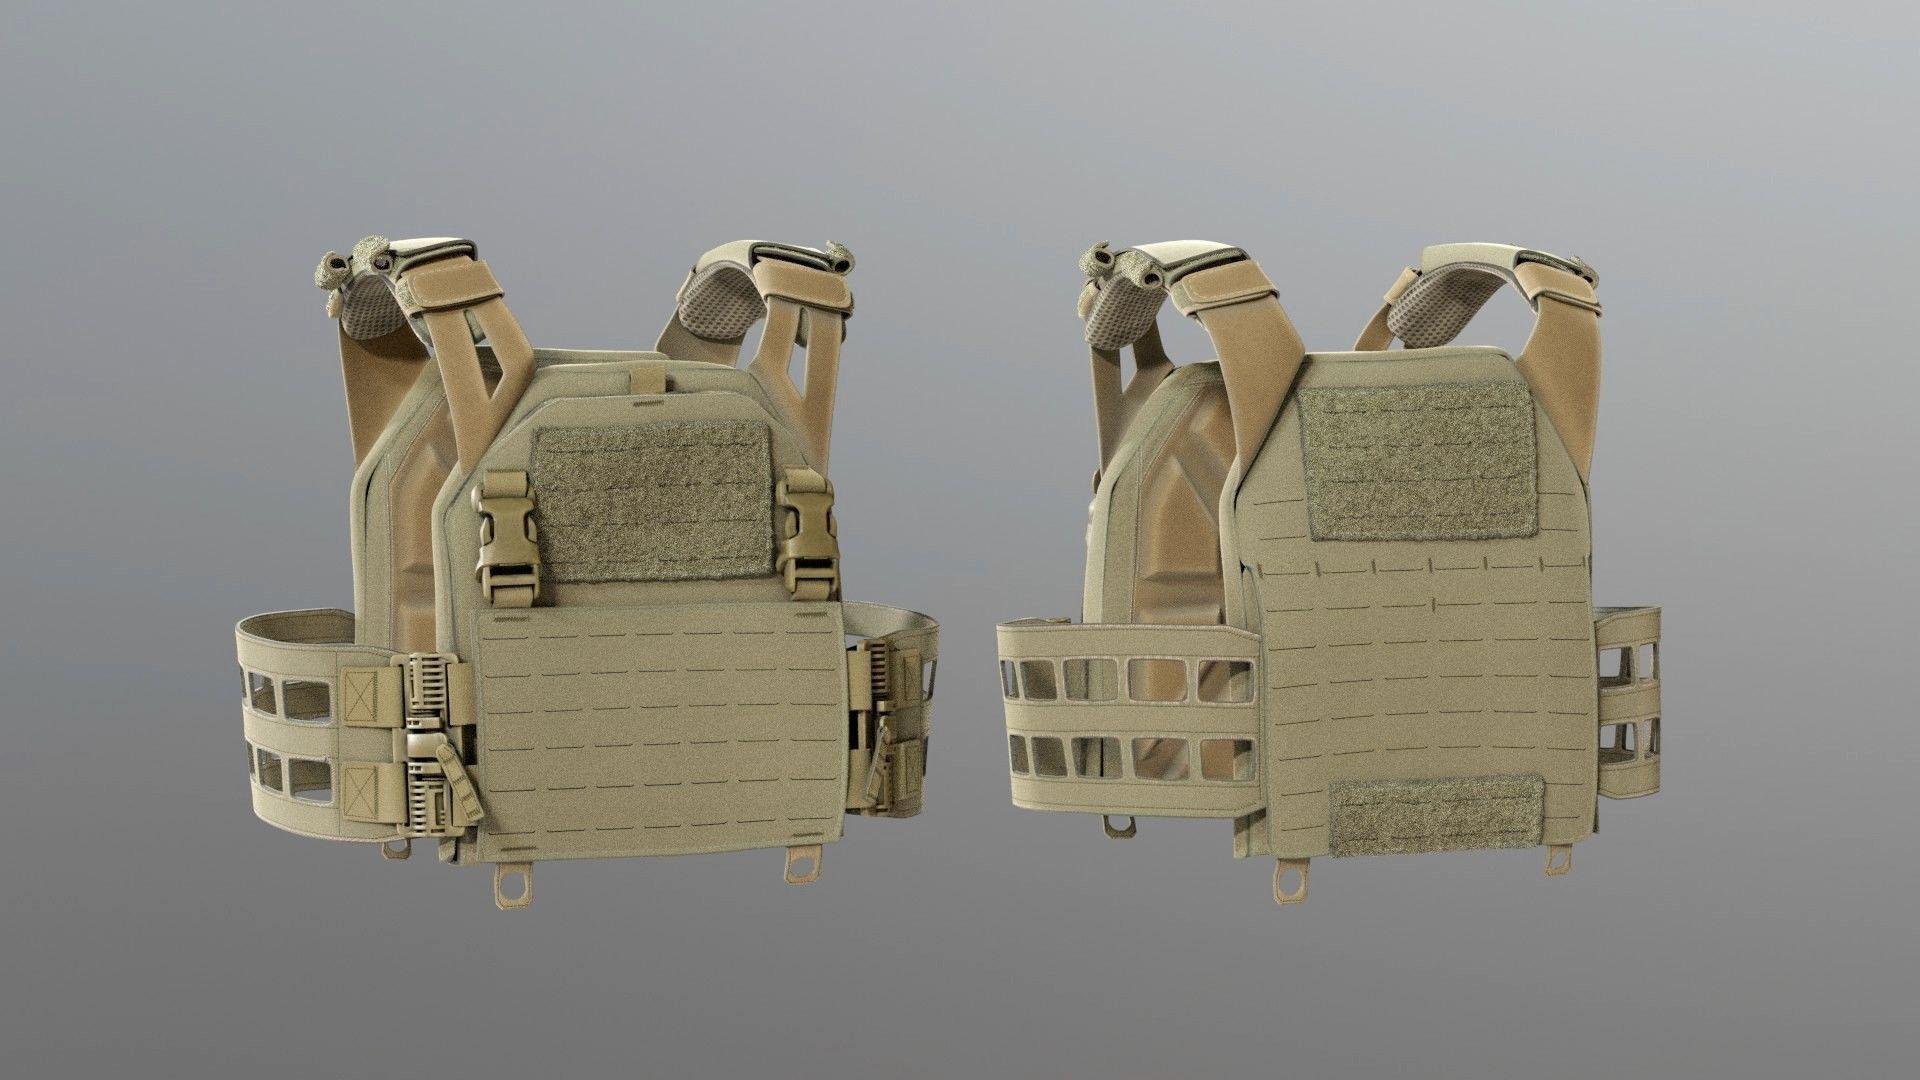 SOLDIER Bulletproof Vest 05